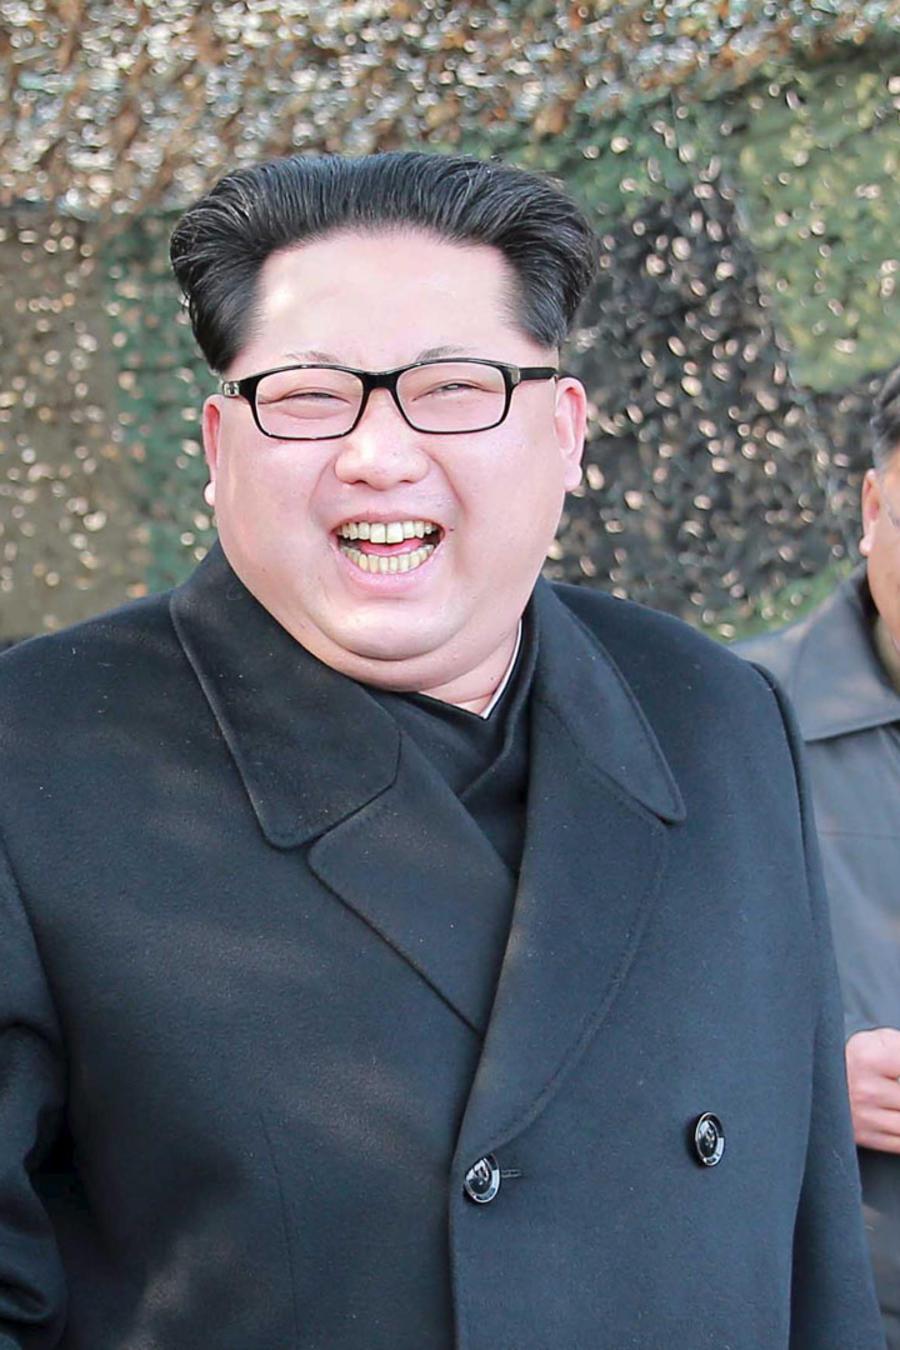 presidente corea del norte